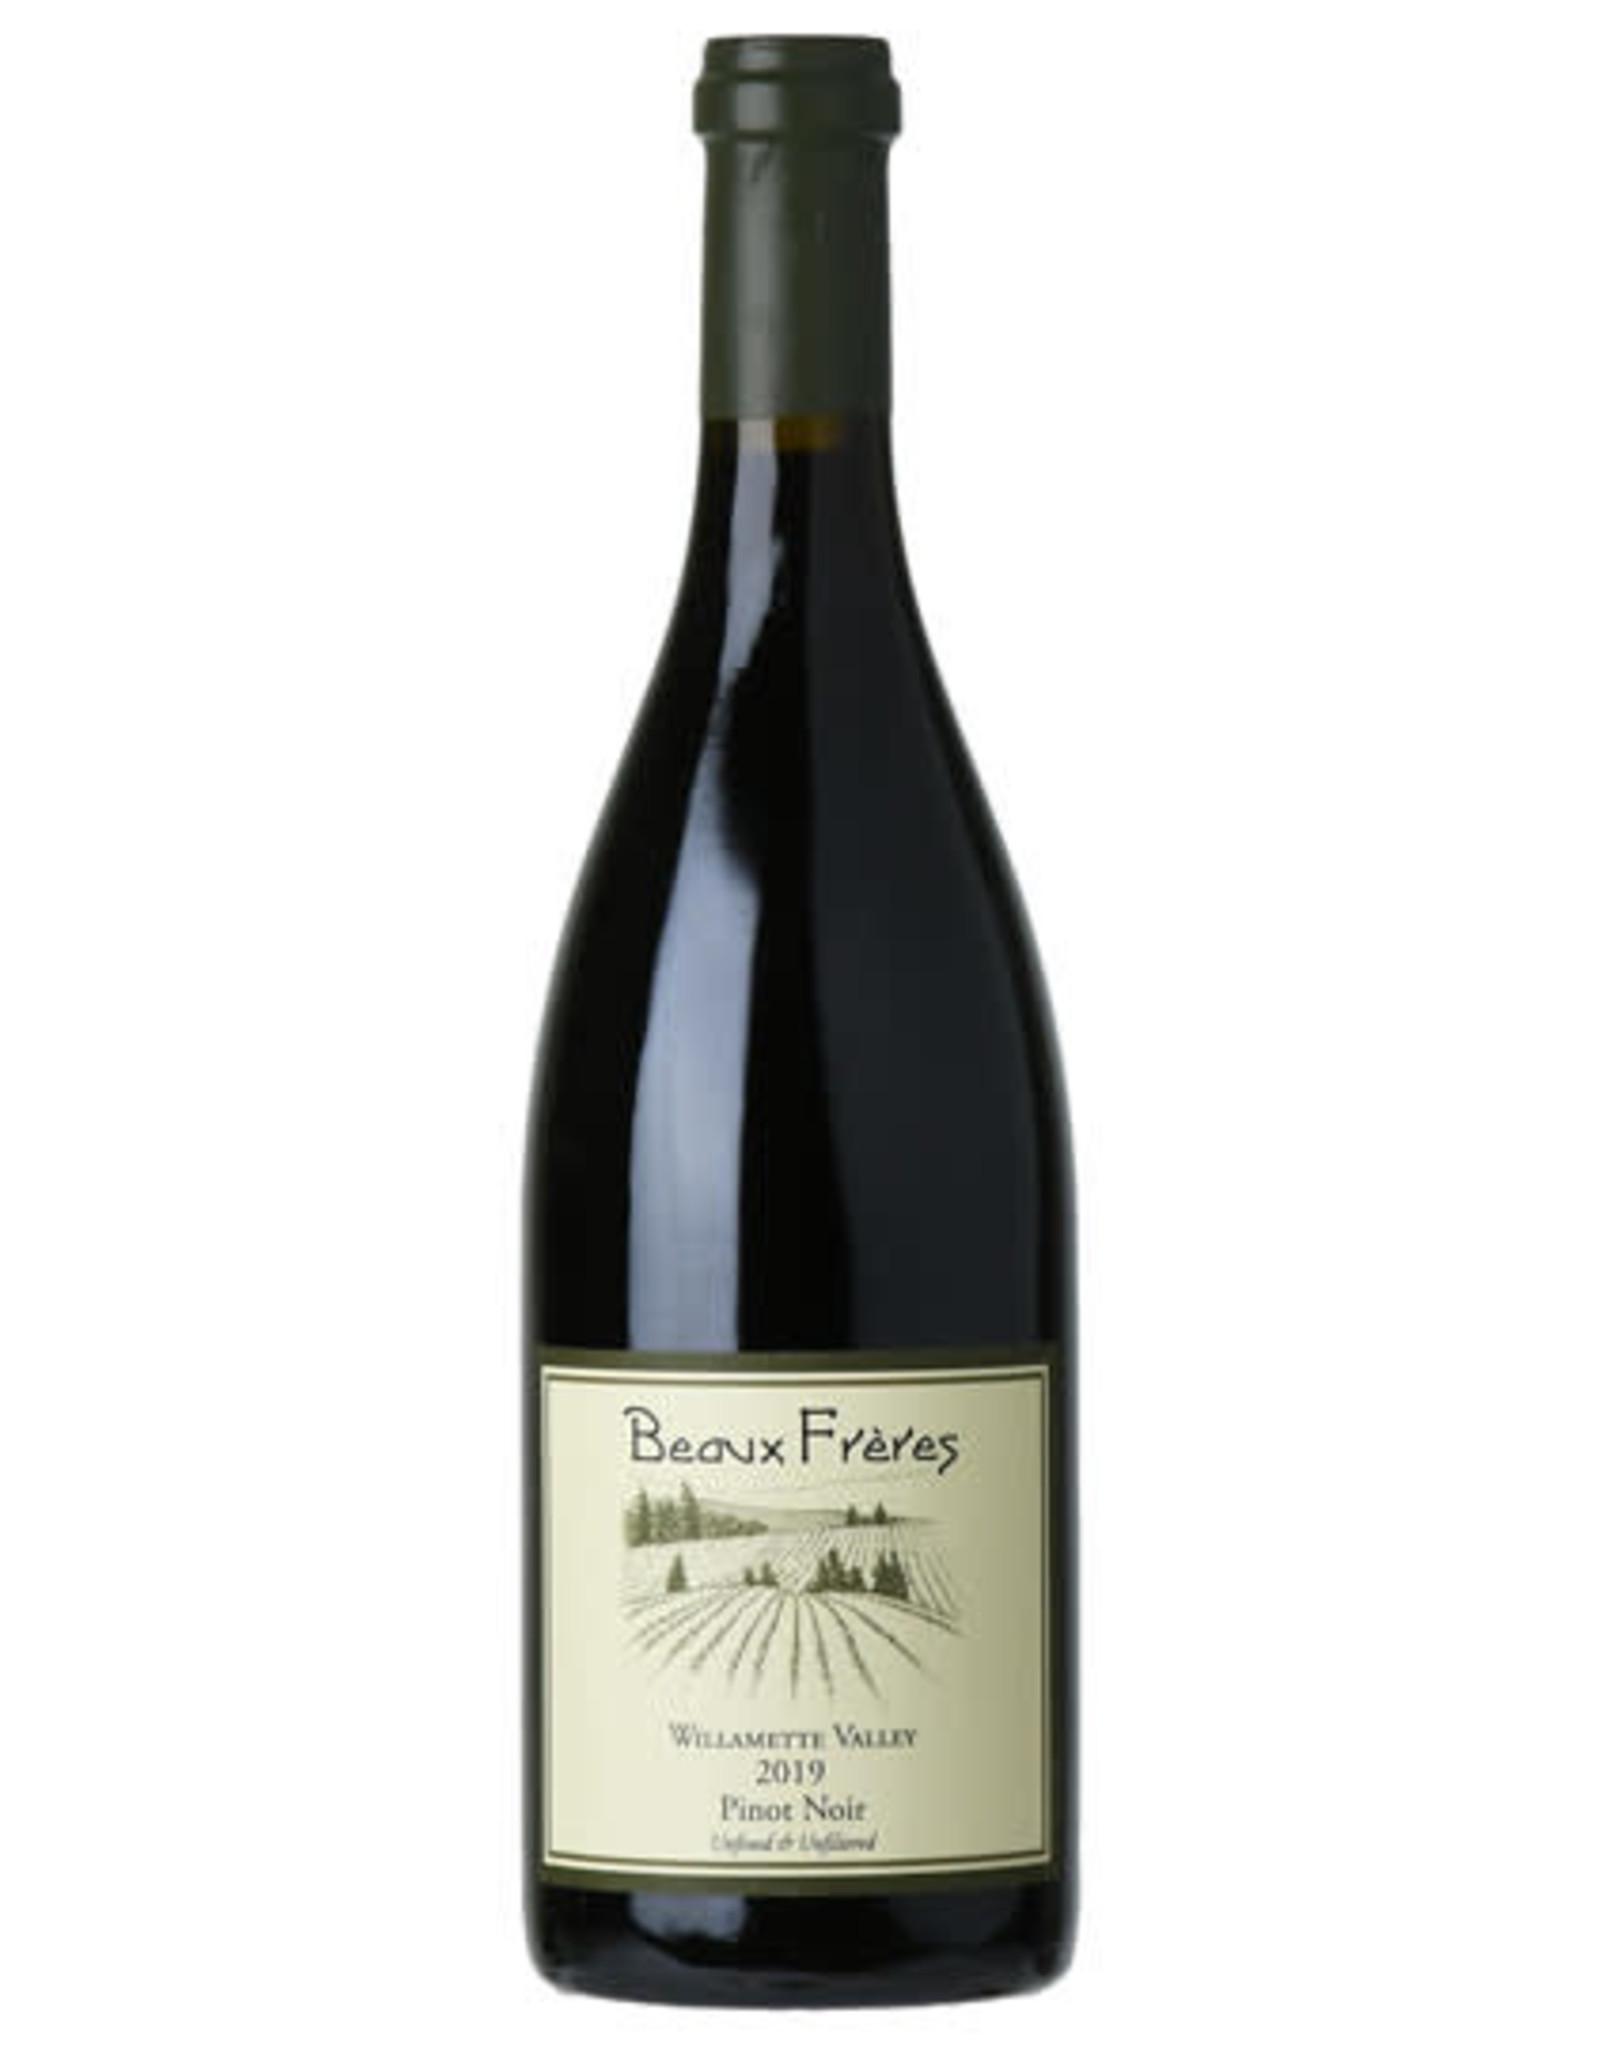 Beaux Freres Willamette Valley Pinot Noir 2019